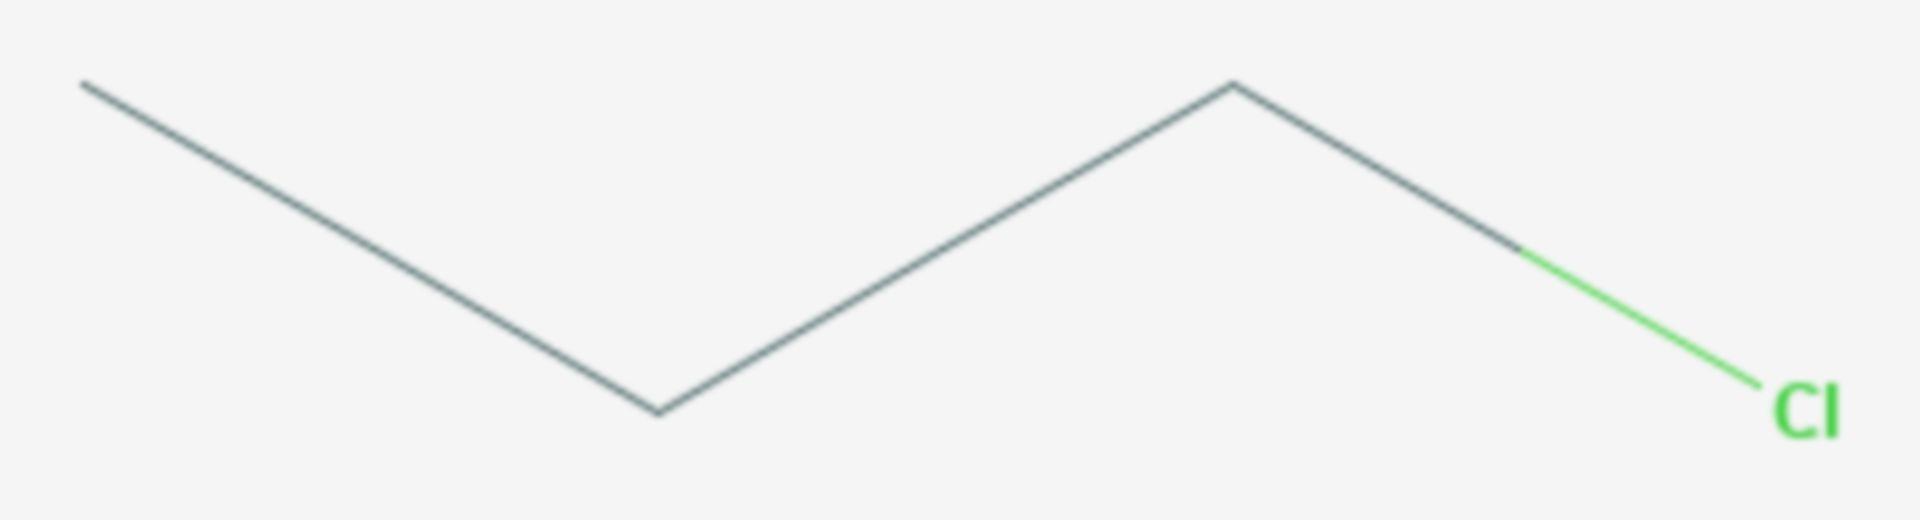 1-Chlorpropan (Strukturformel)